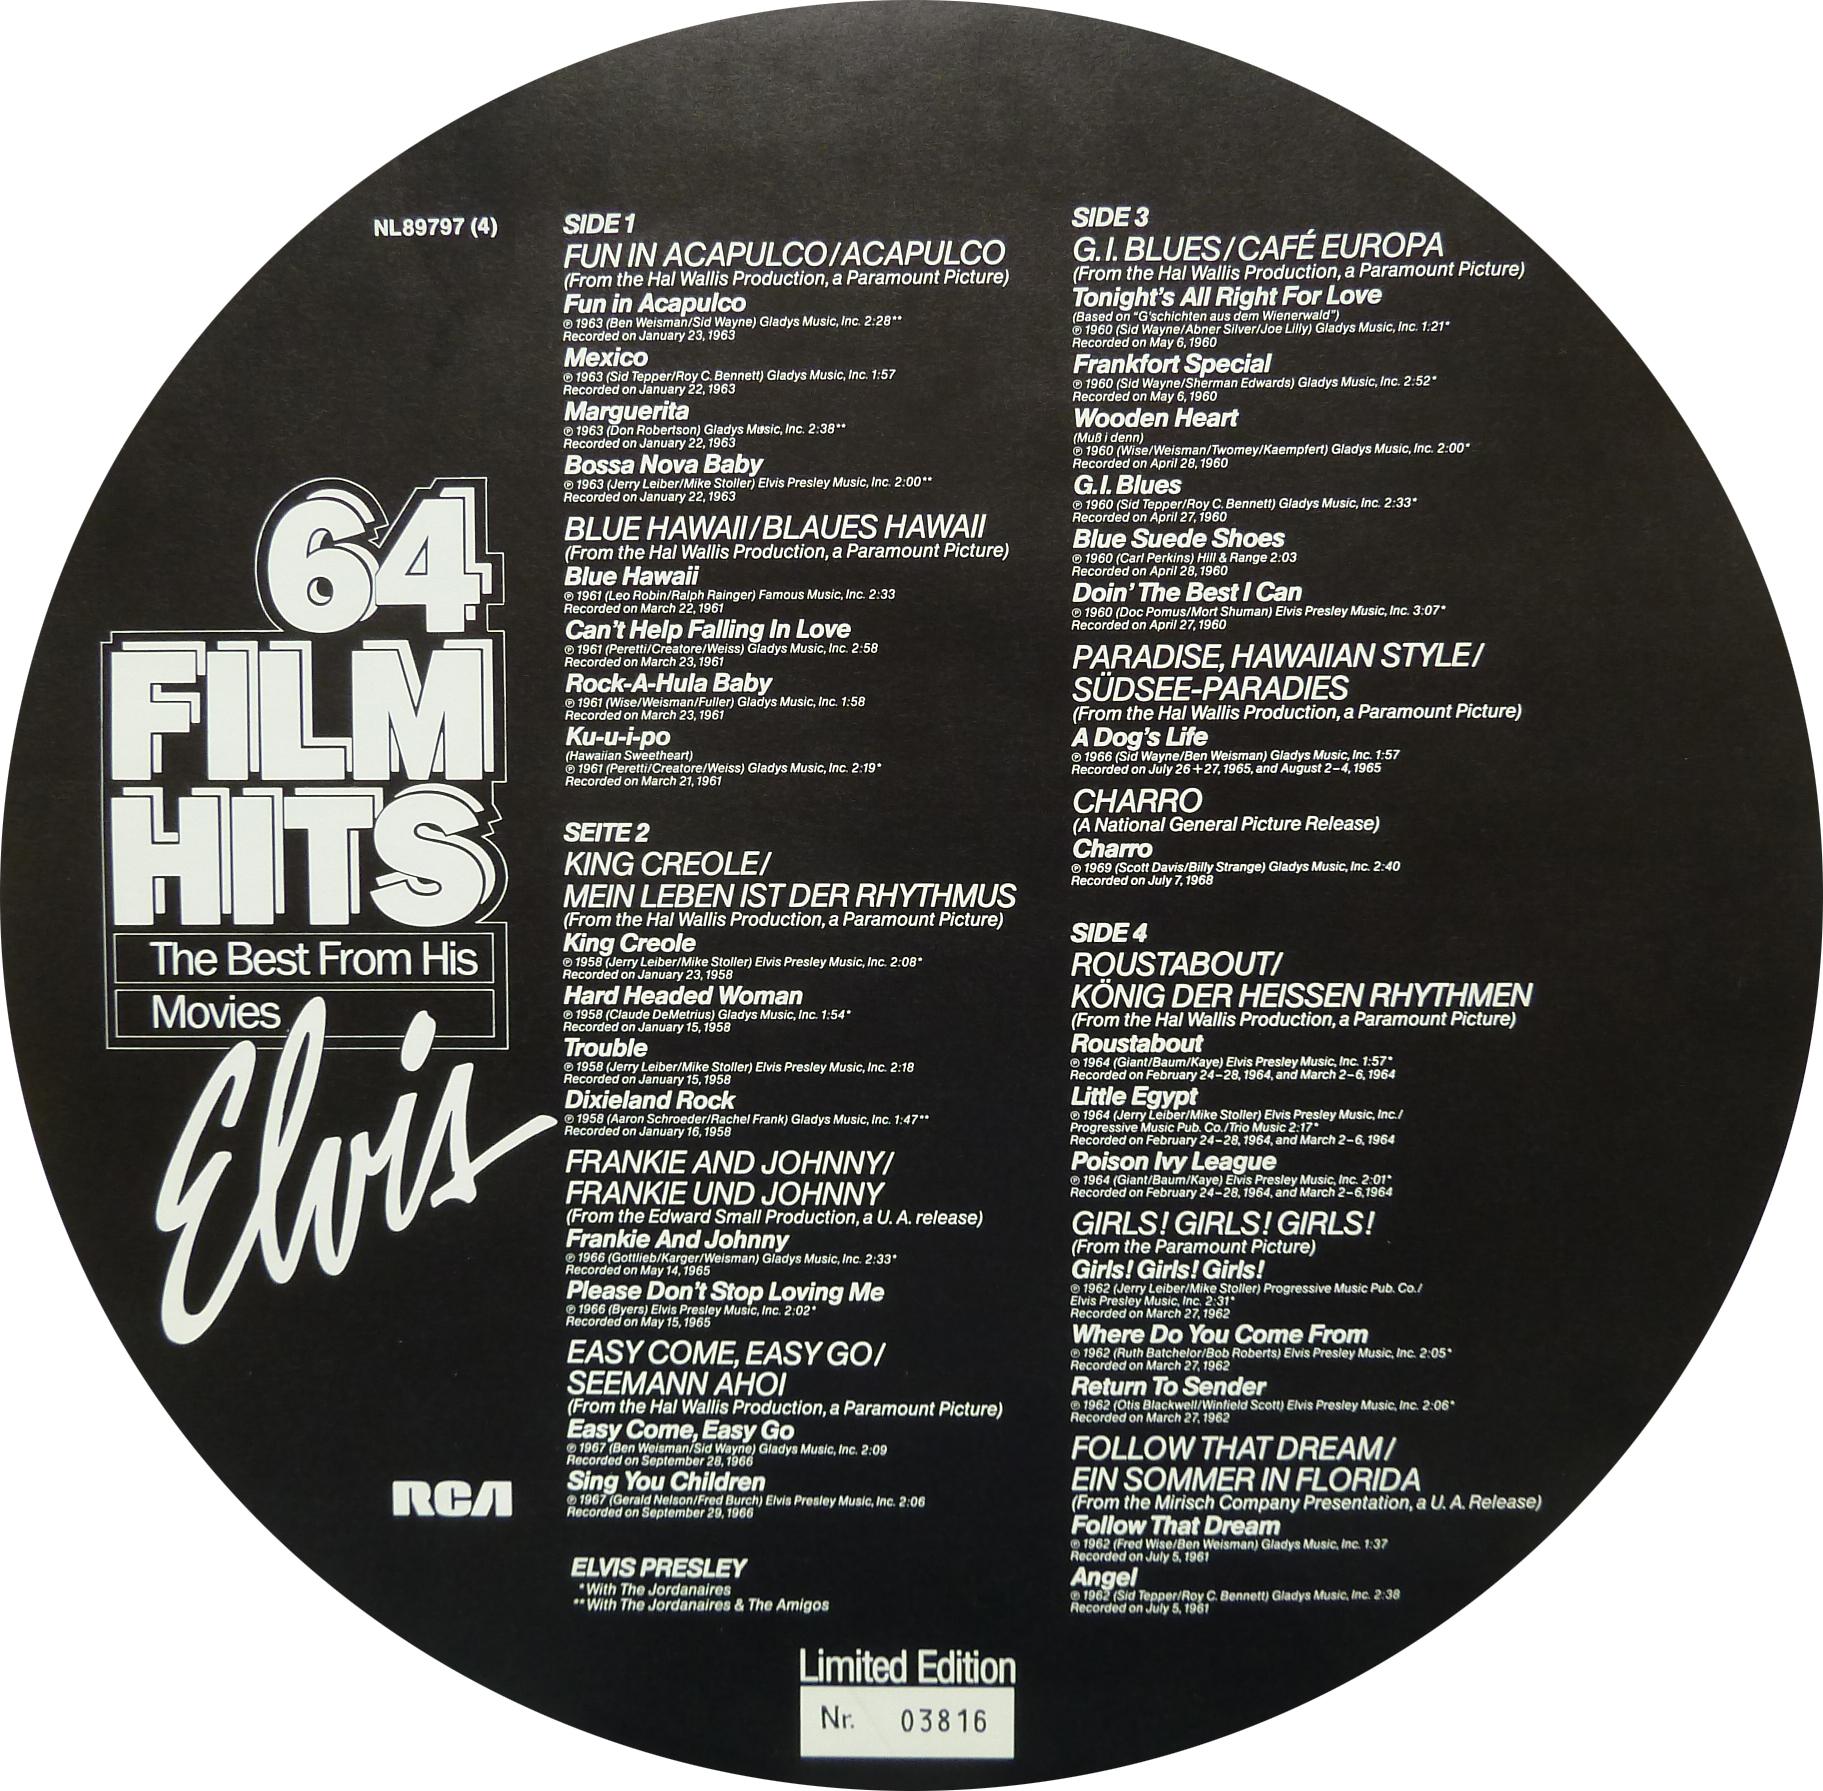 64 FILM HITS 64filmhitsbeiblattseifbpgl